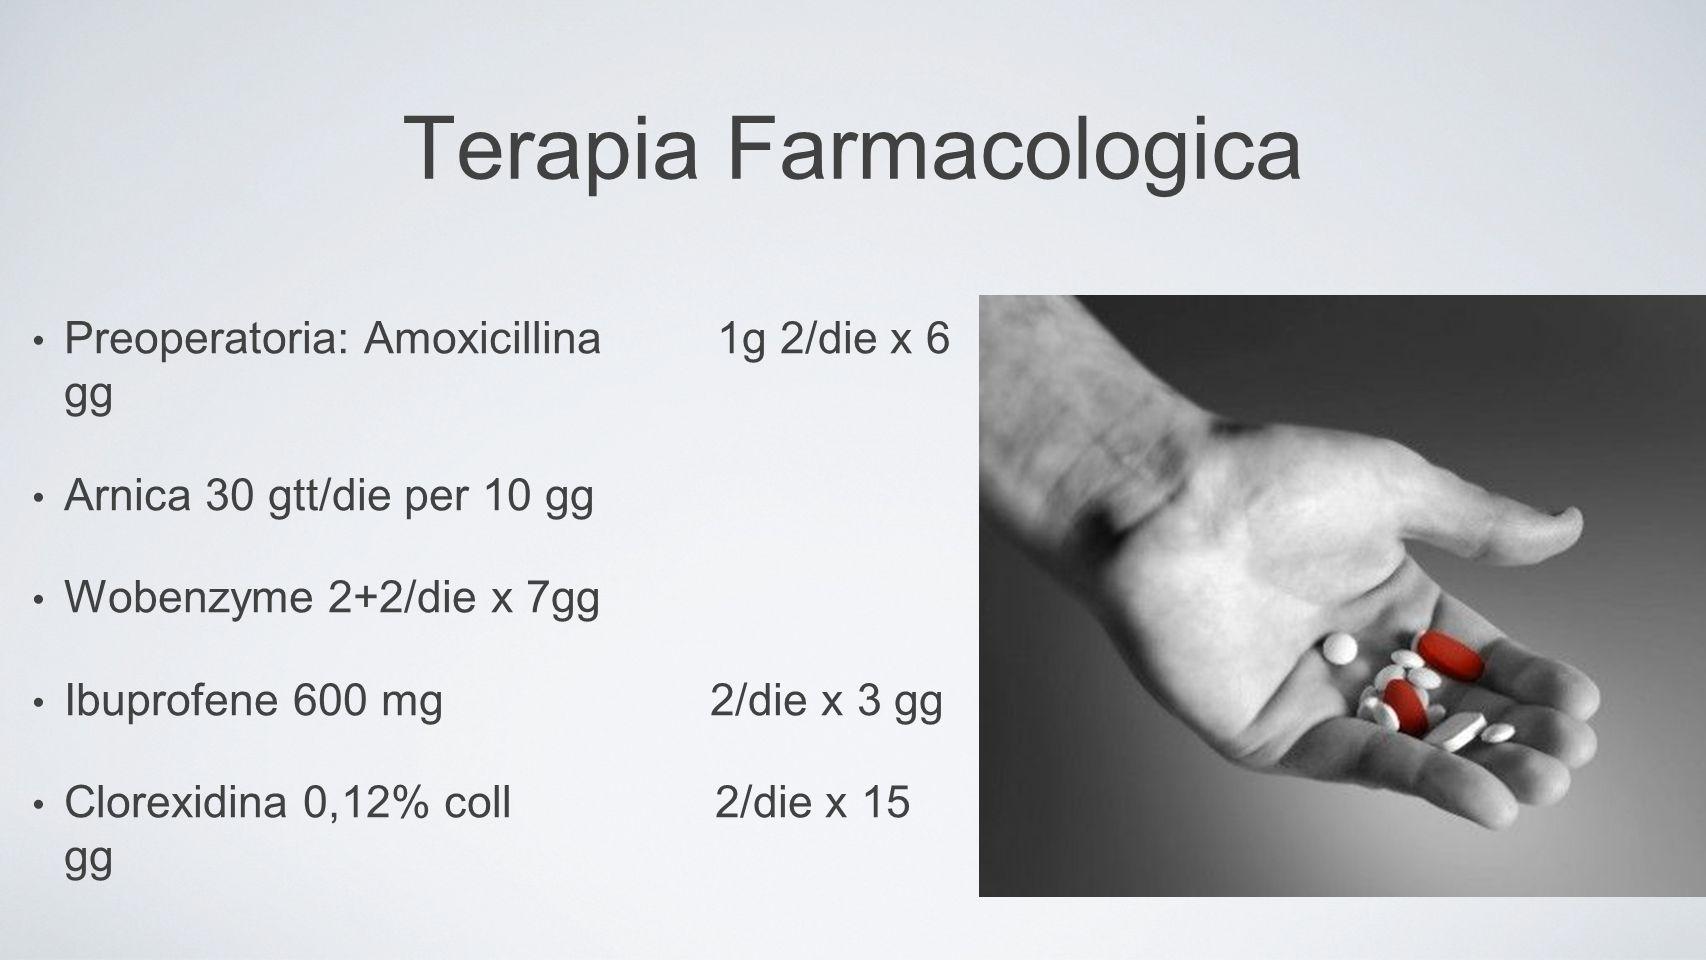 Terapia Farmacologica Preoperatoria: Amoxicillina 1g 2/die x 6 gg Arnica 30 gtt/die per 10 gg Wobenzyme 2+2/die x 7gg Ibuprofene 600 mg 2/die x 3 gg Clorexidina 0,12% coll 2/die x 15 gg